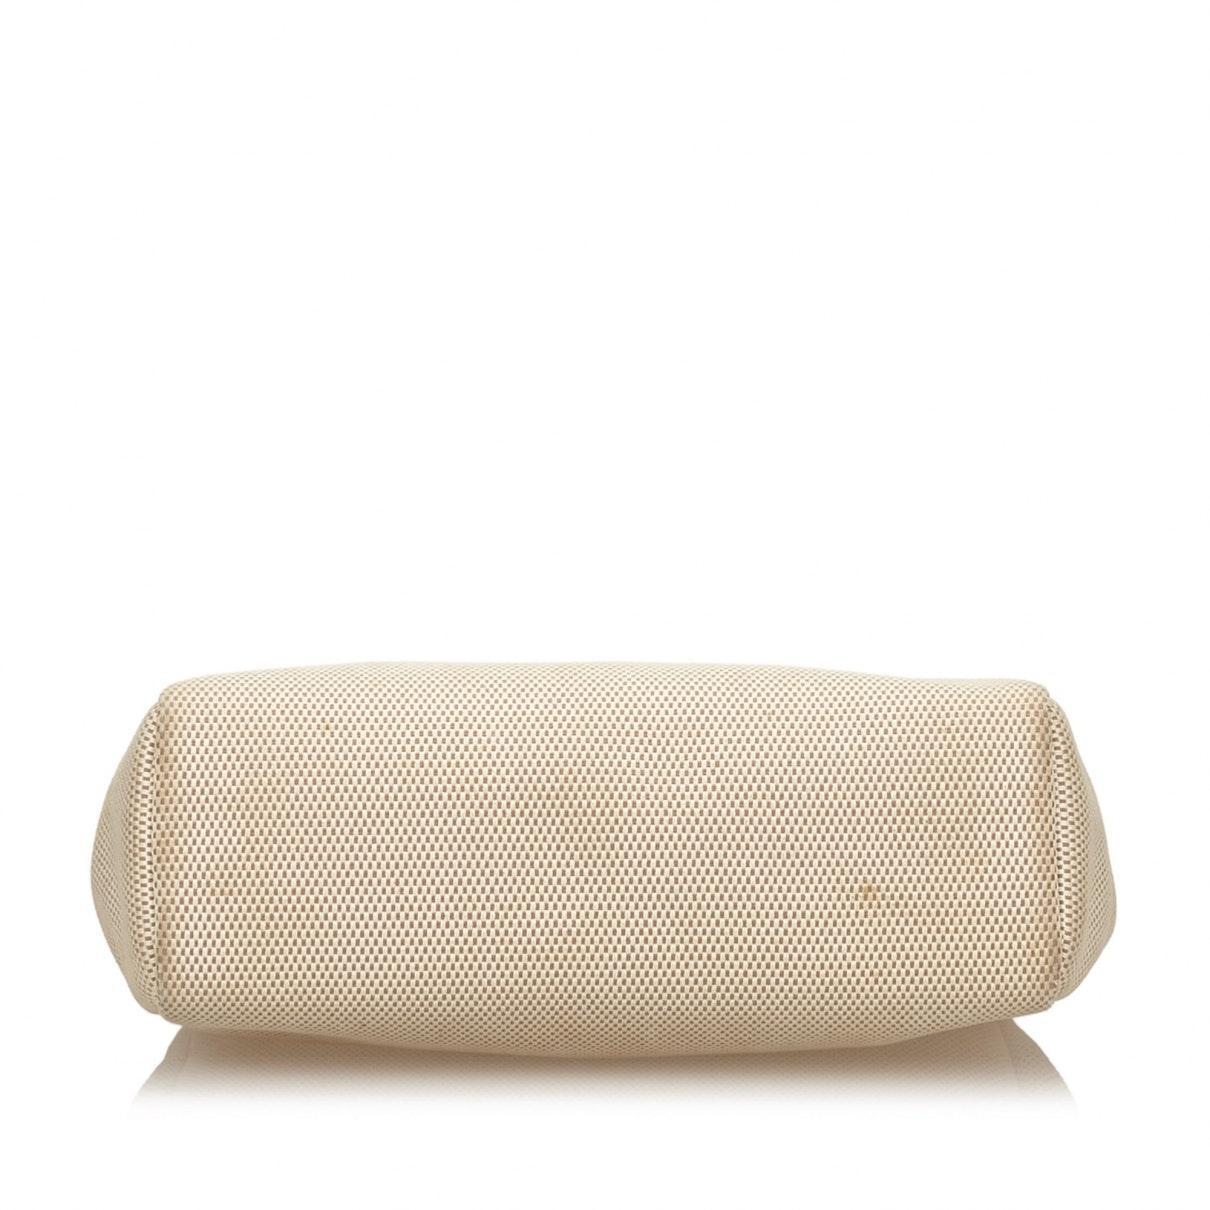 Sacs à main Herbag en Coton Hermès CQcO